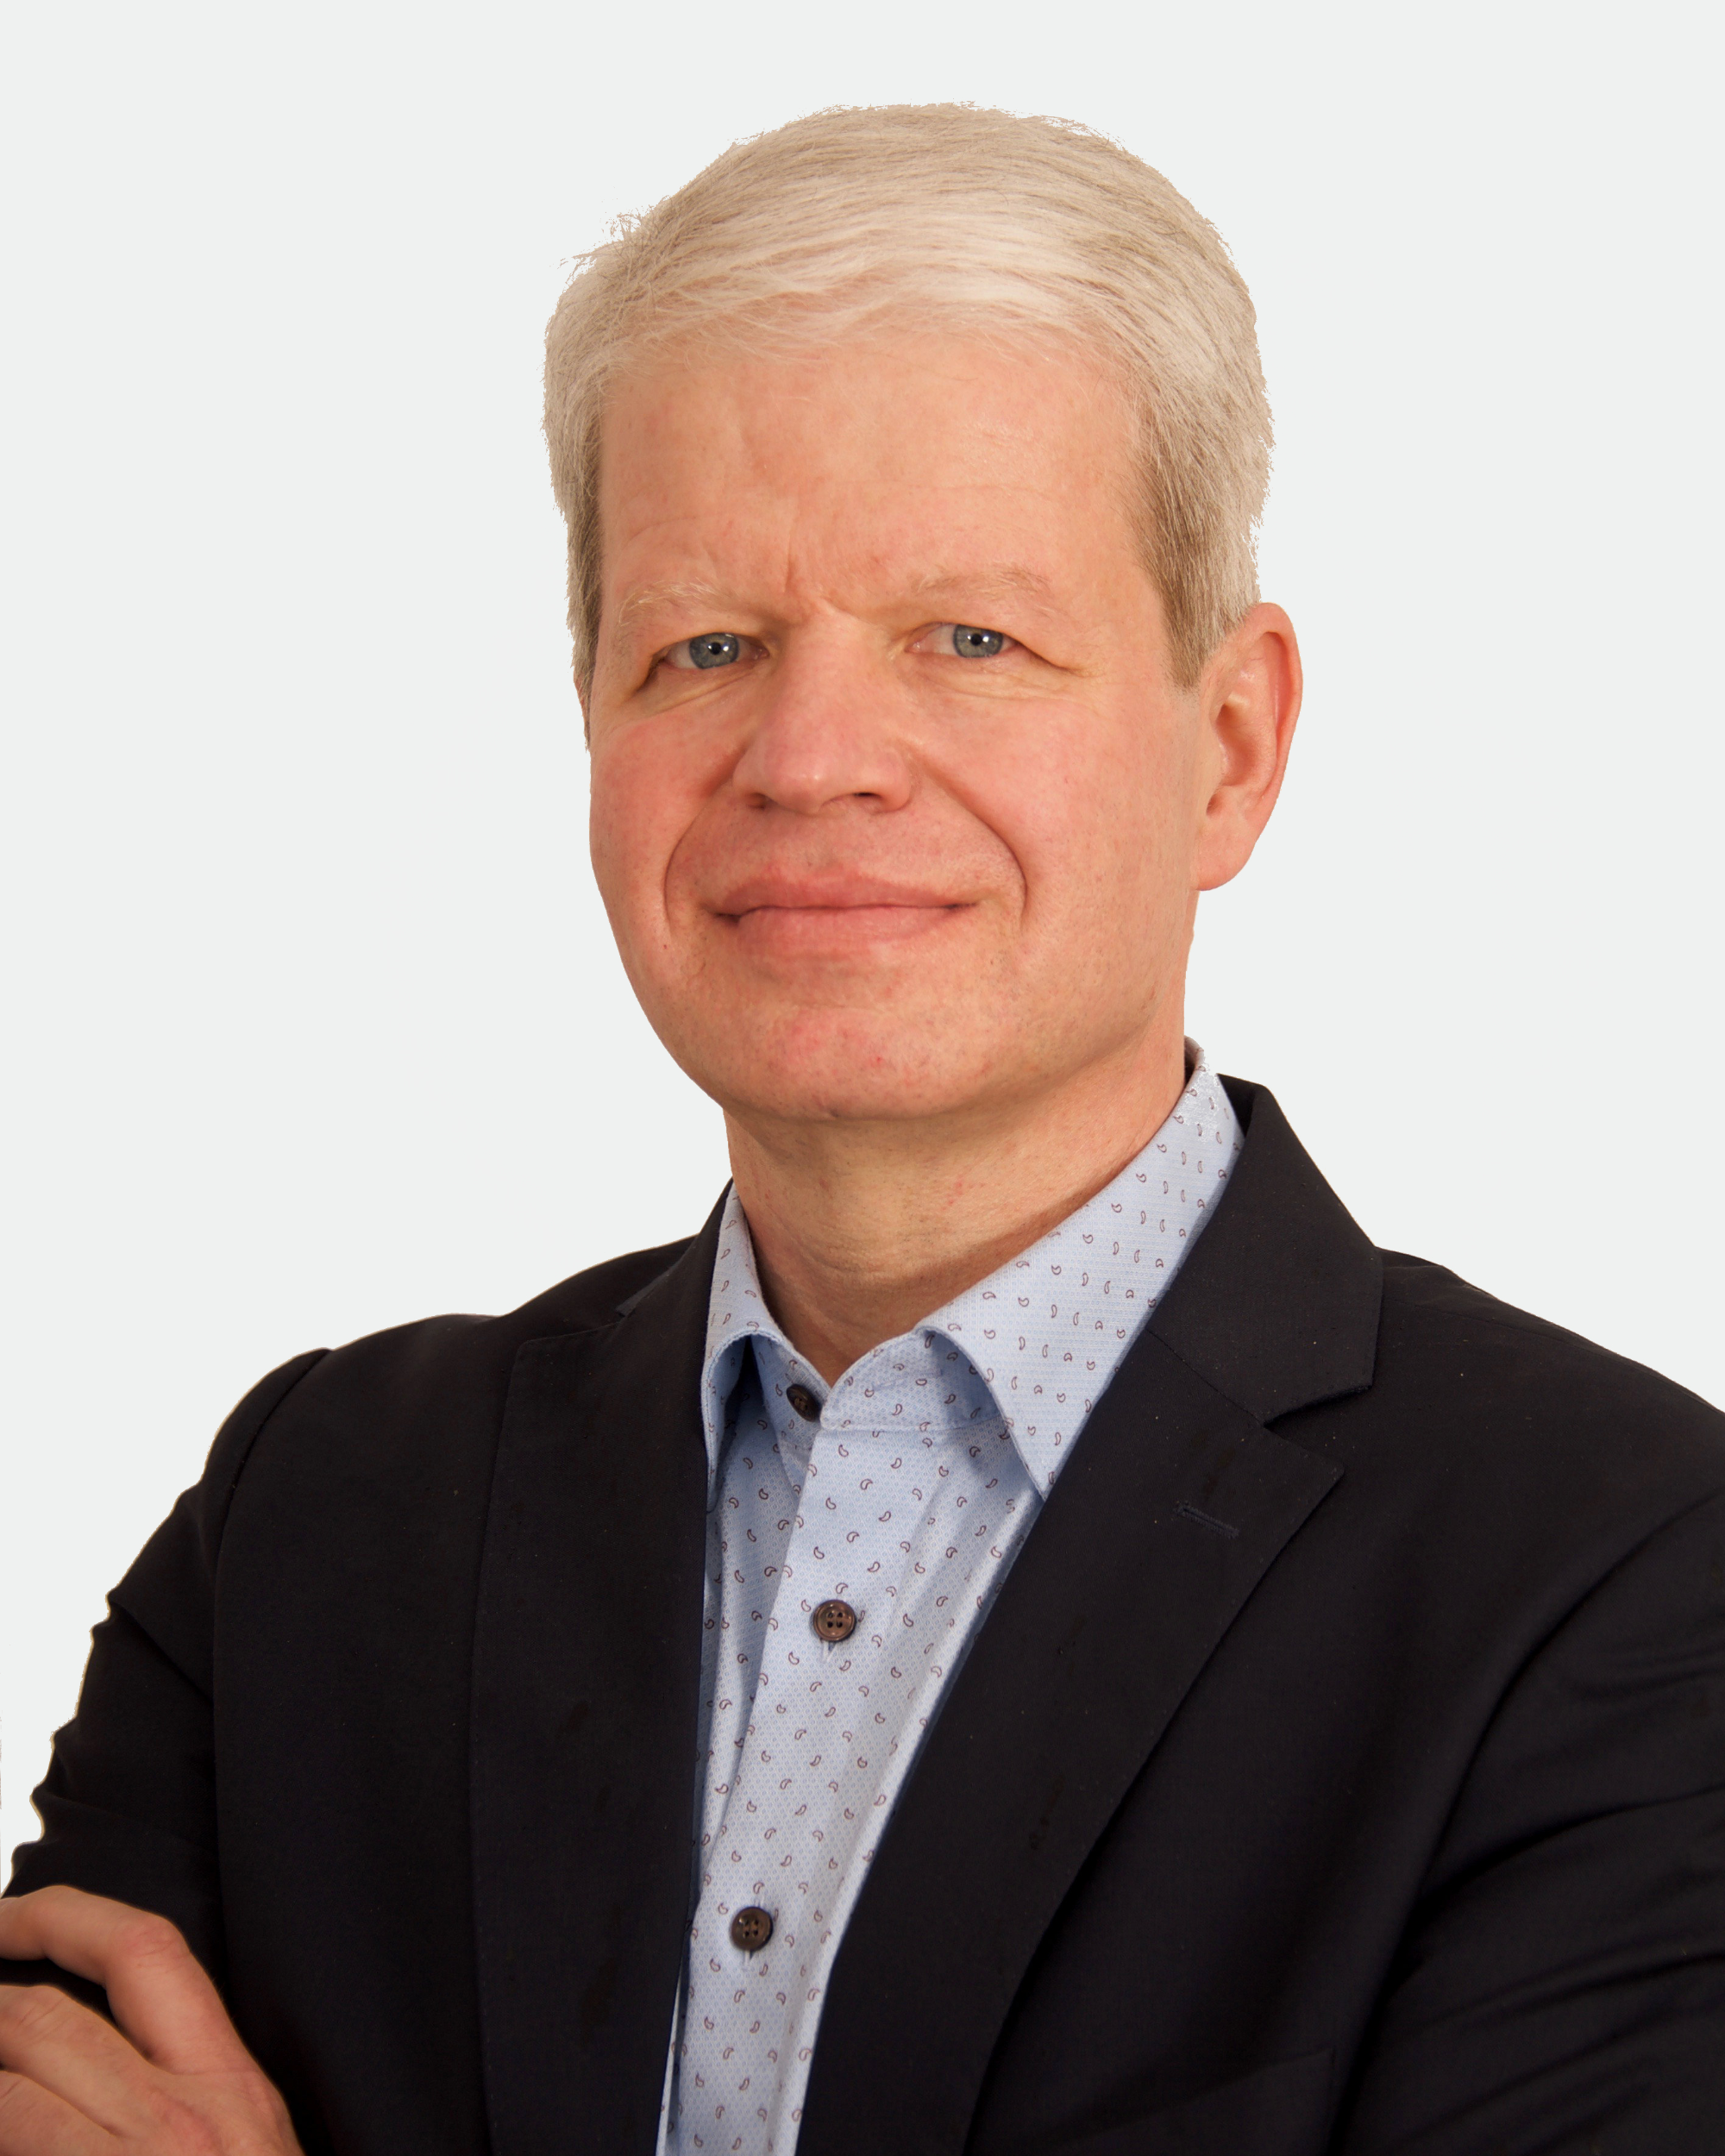 Dipl. Ing. Christian Fadanelli